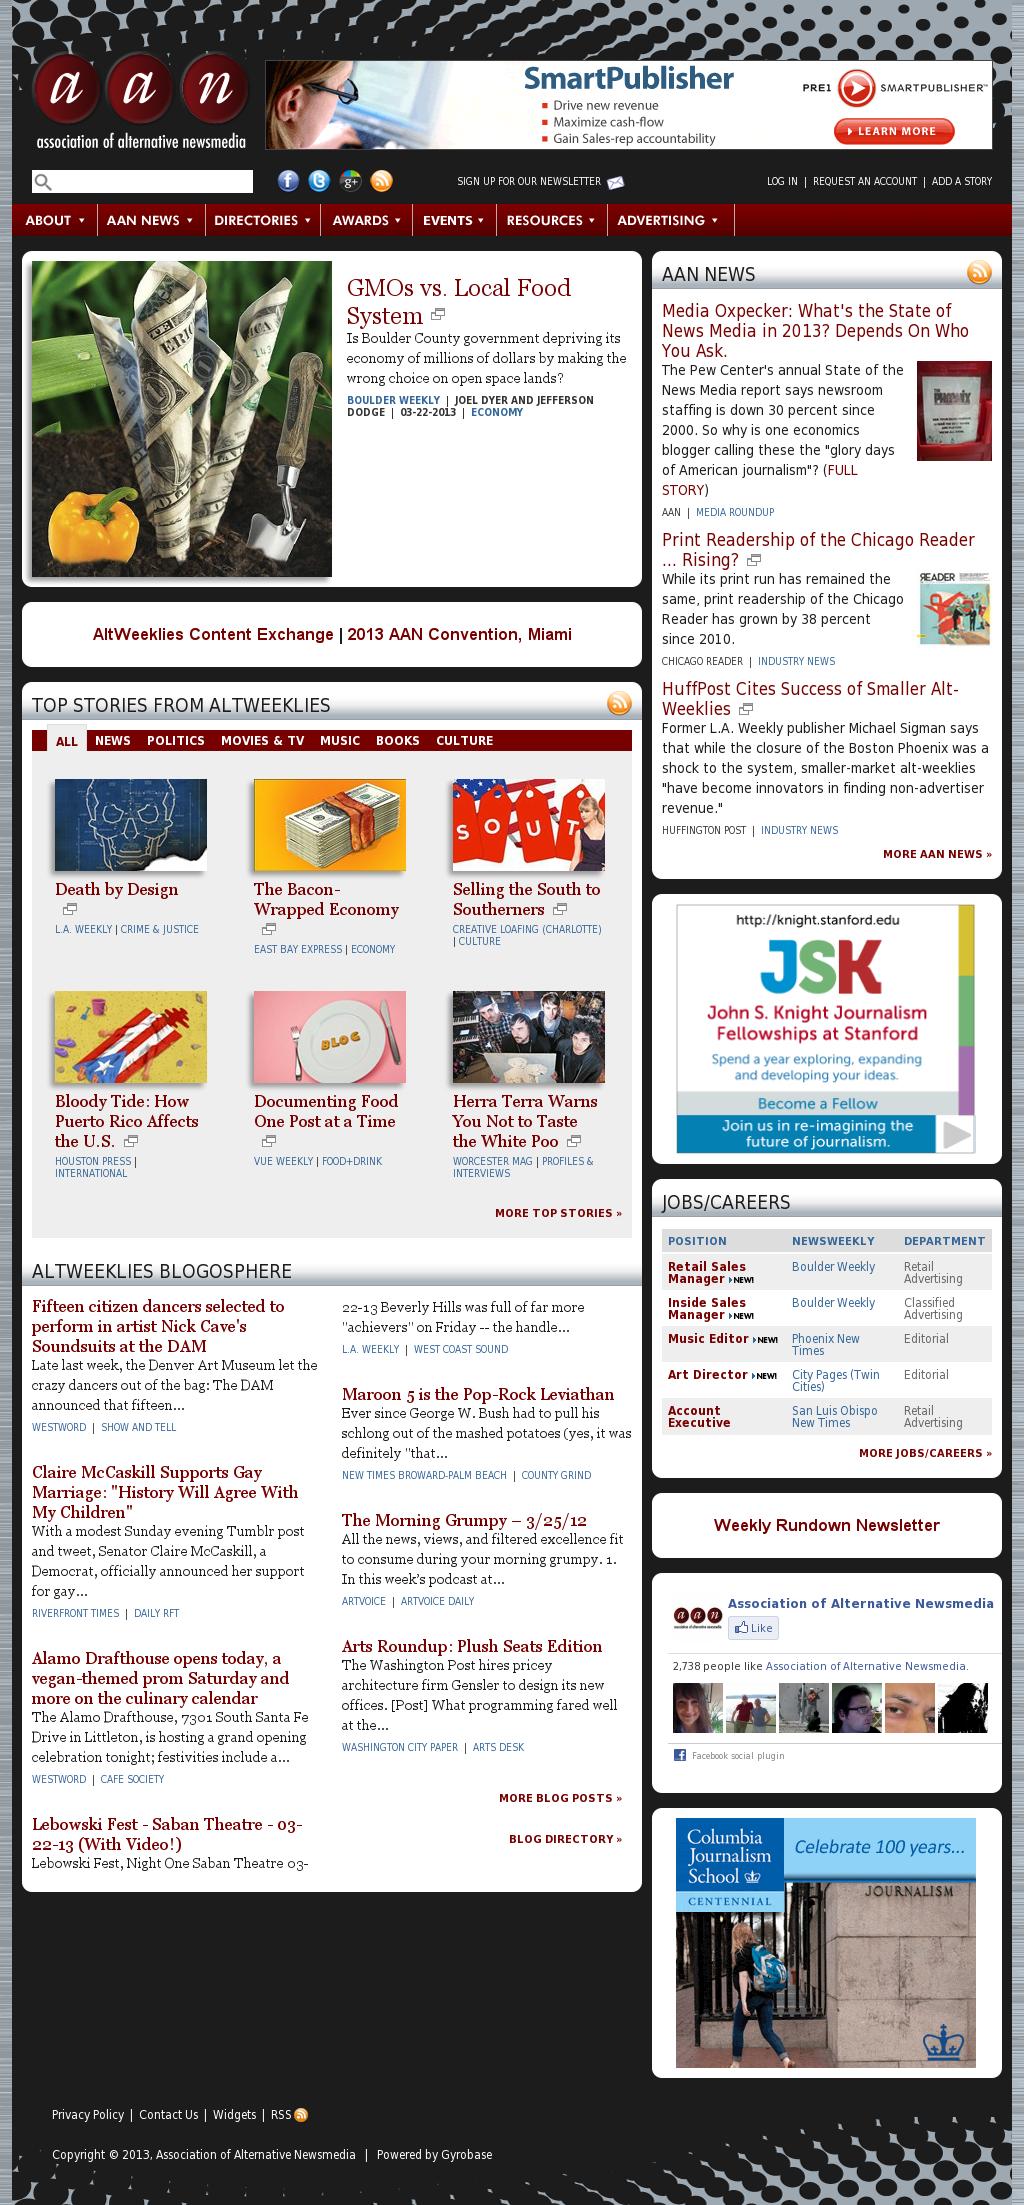 Association of Alternative Newsmedia at Monday March 25, 2013, 2:08 p.m. UTC